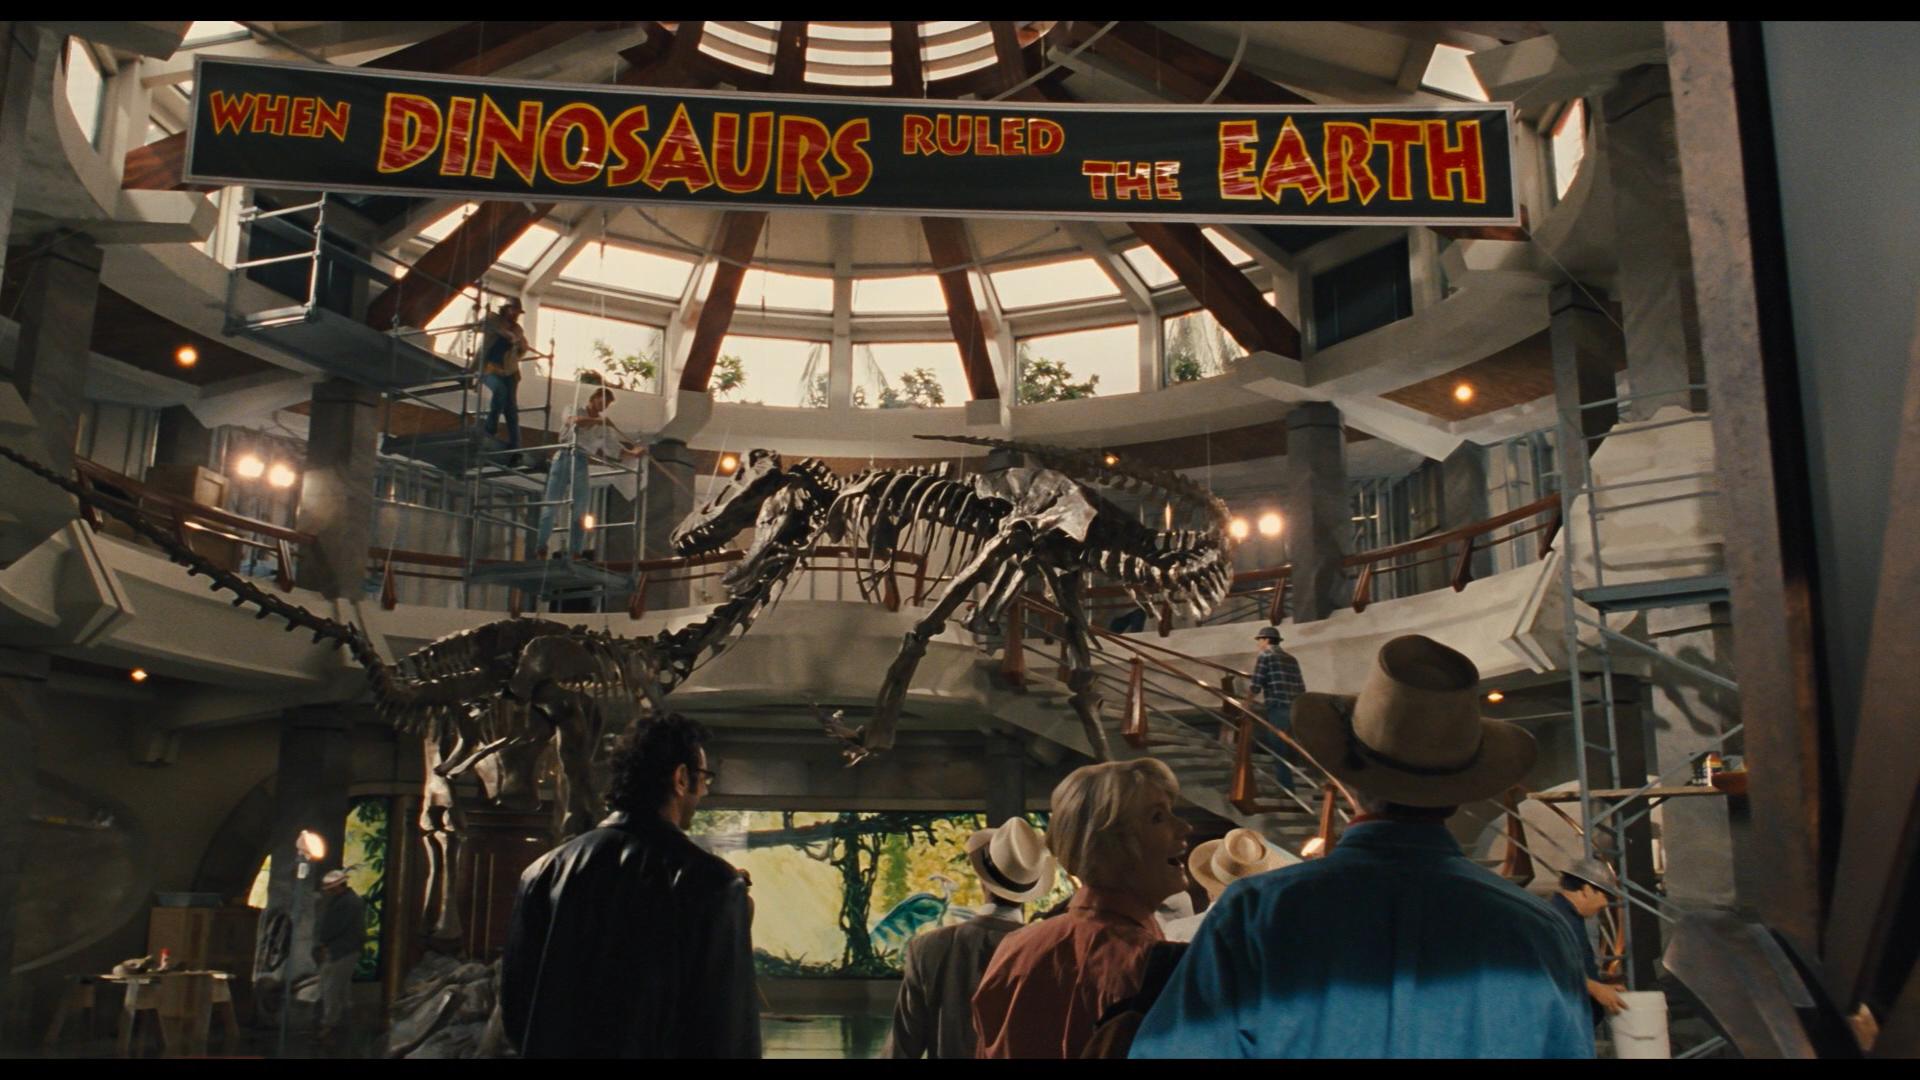 Wall Stickers Dinosaurs Alamosaurus Jurassic Park Wiki Fandom Powered By Wikia